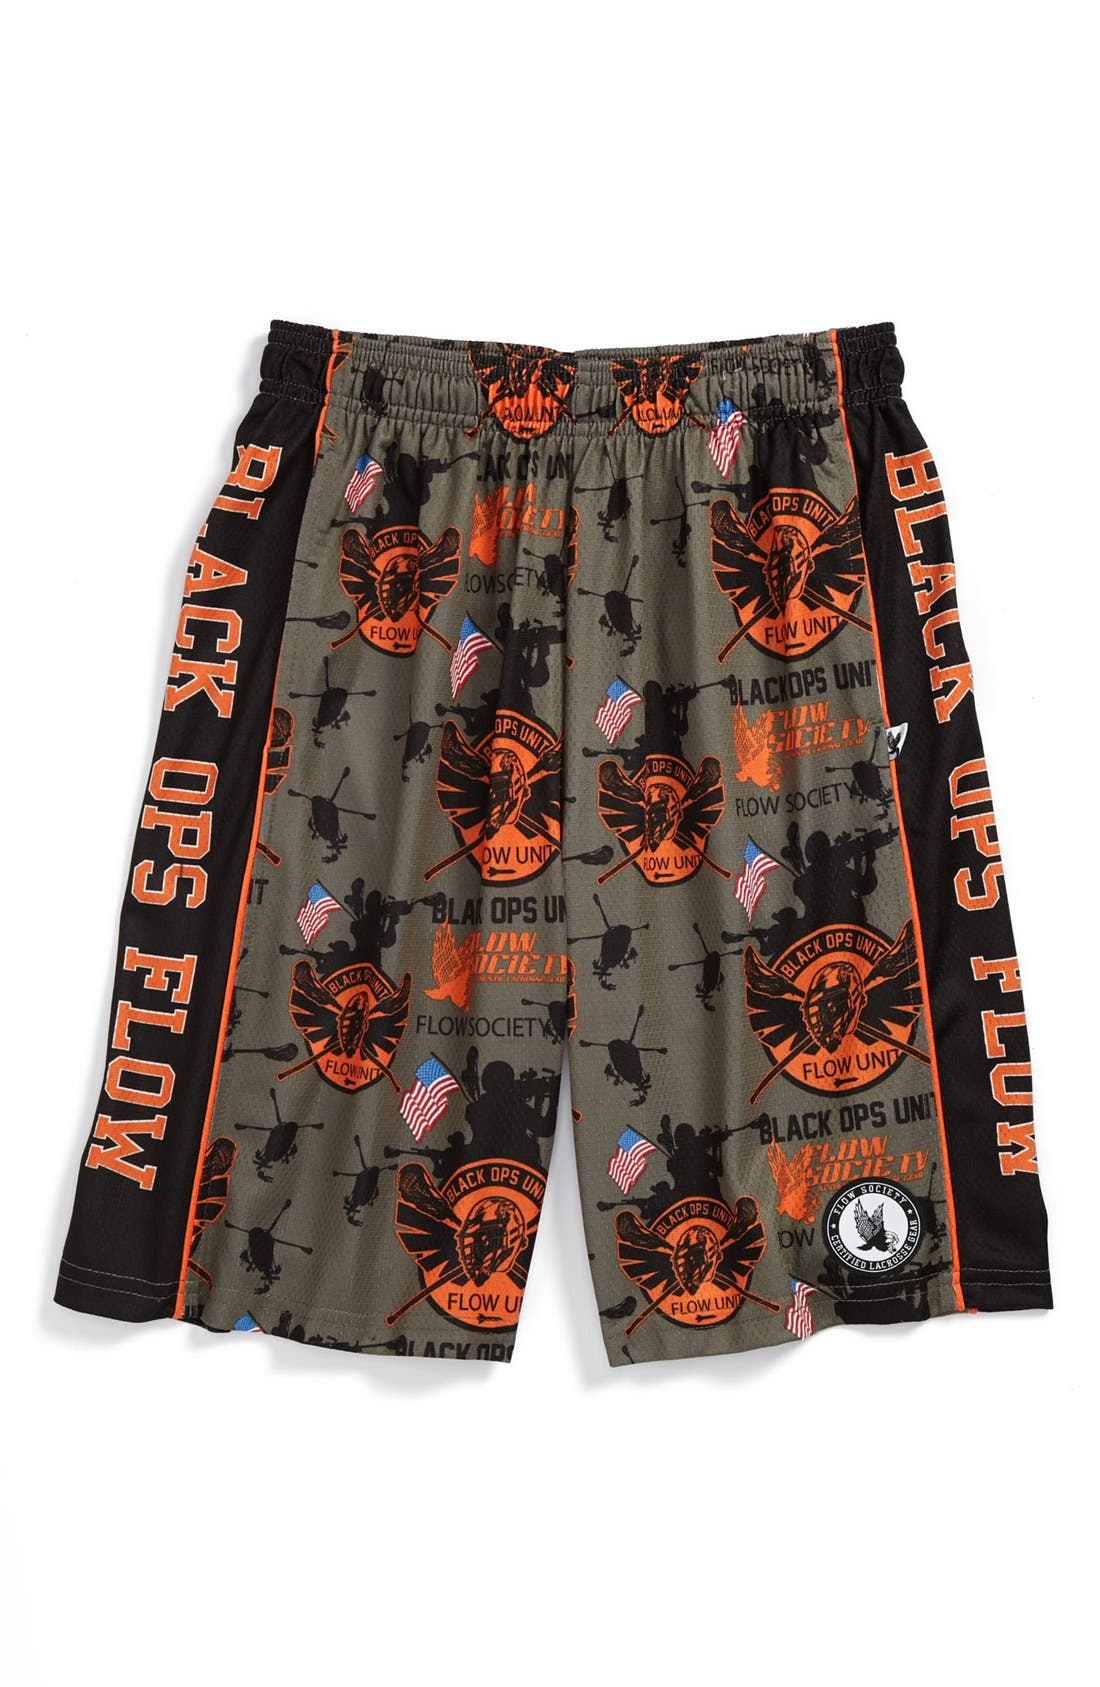 Alternate Image 1 Selected - Flow Society 'Black Ops Flow' Lacrosse Shorts (Little Boys & Big Boys)